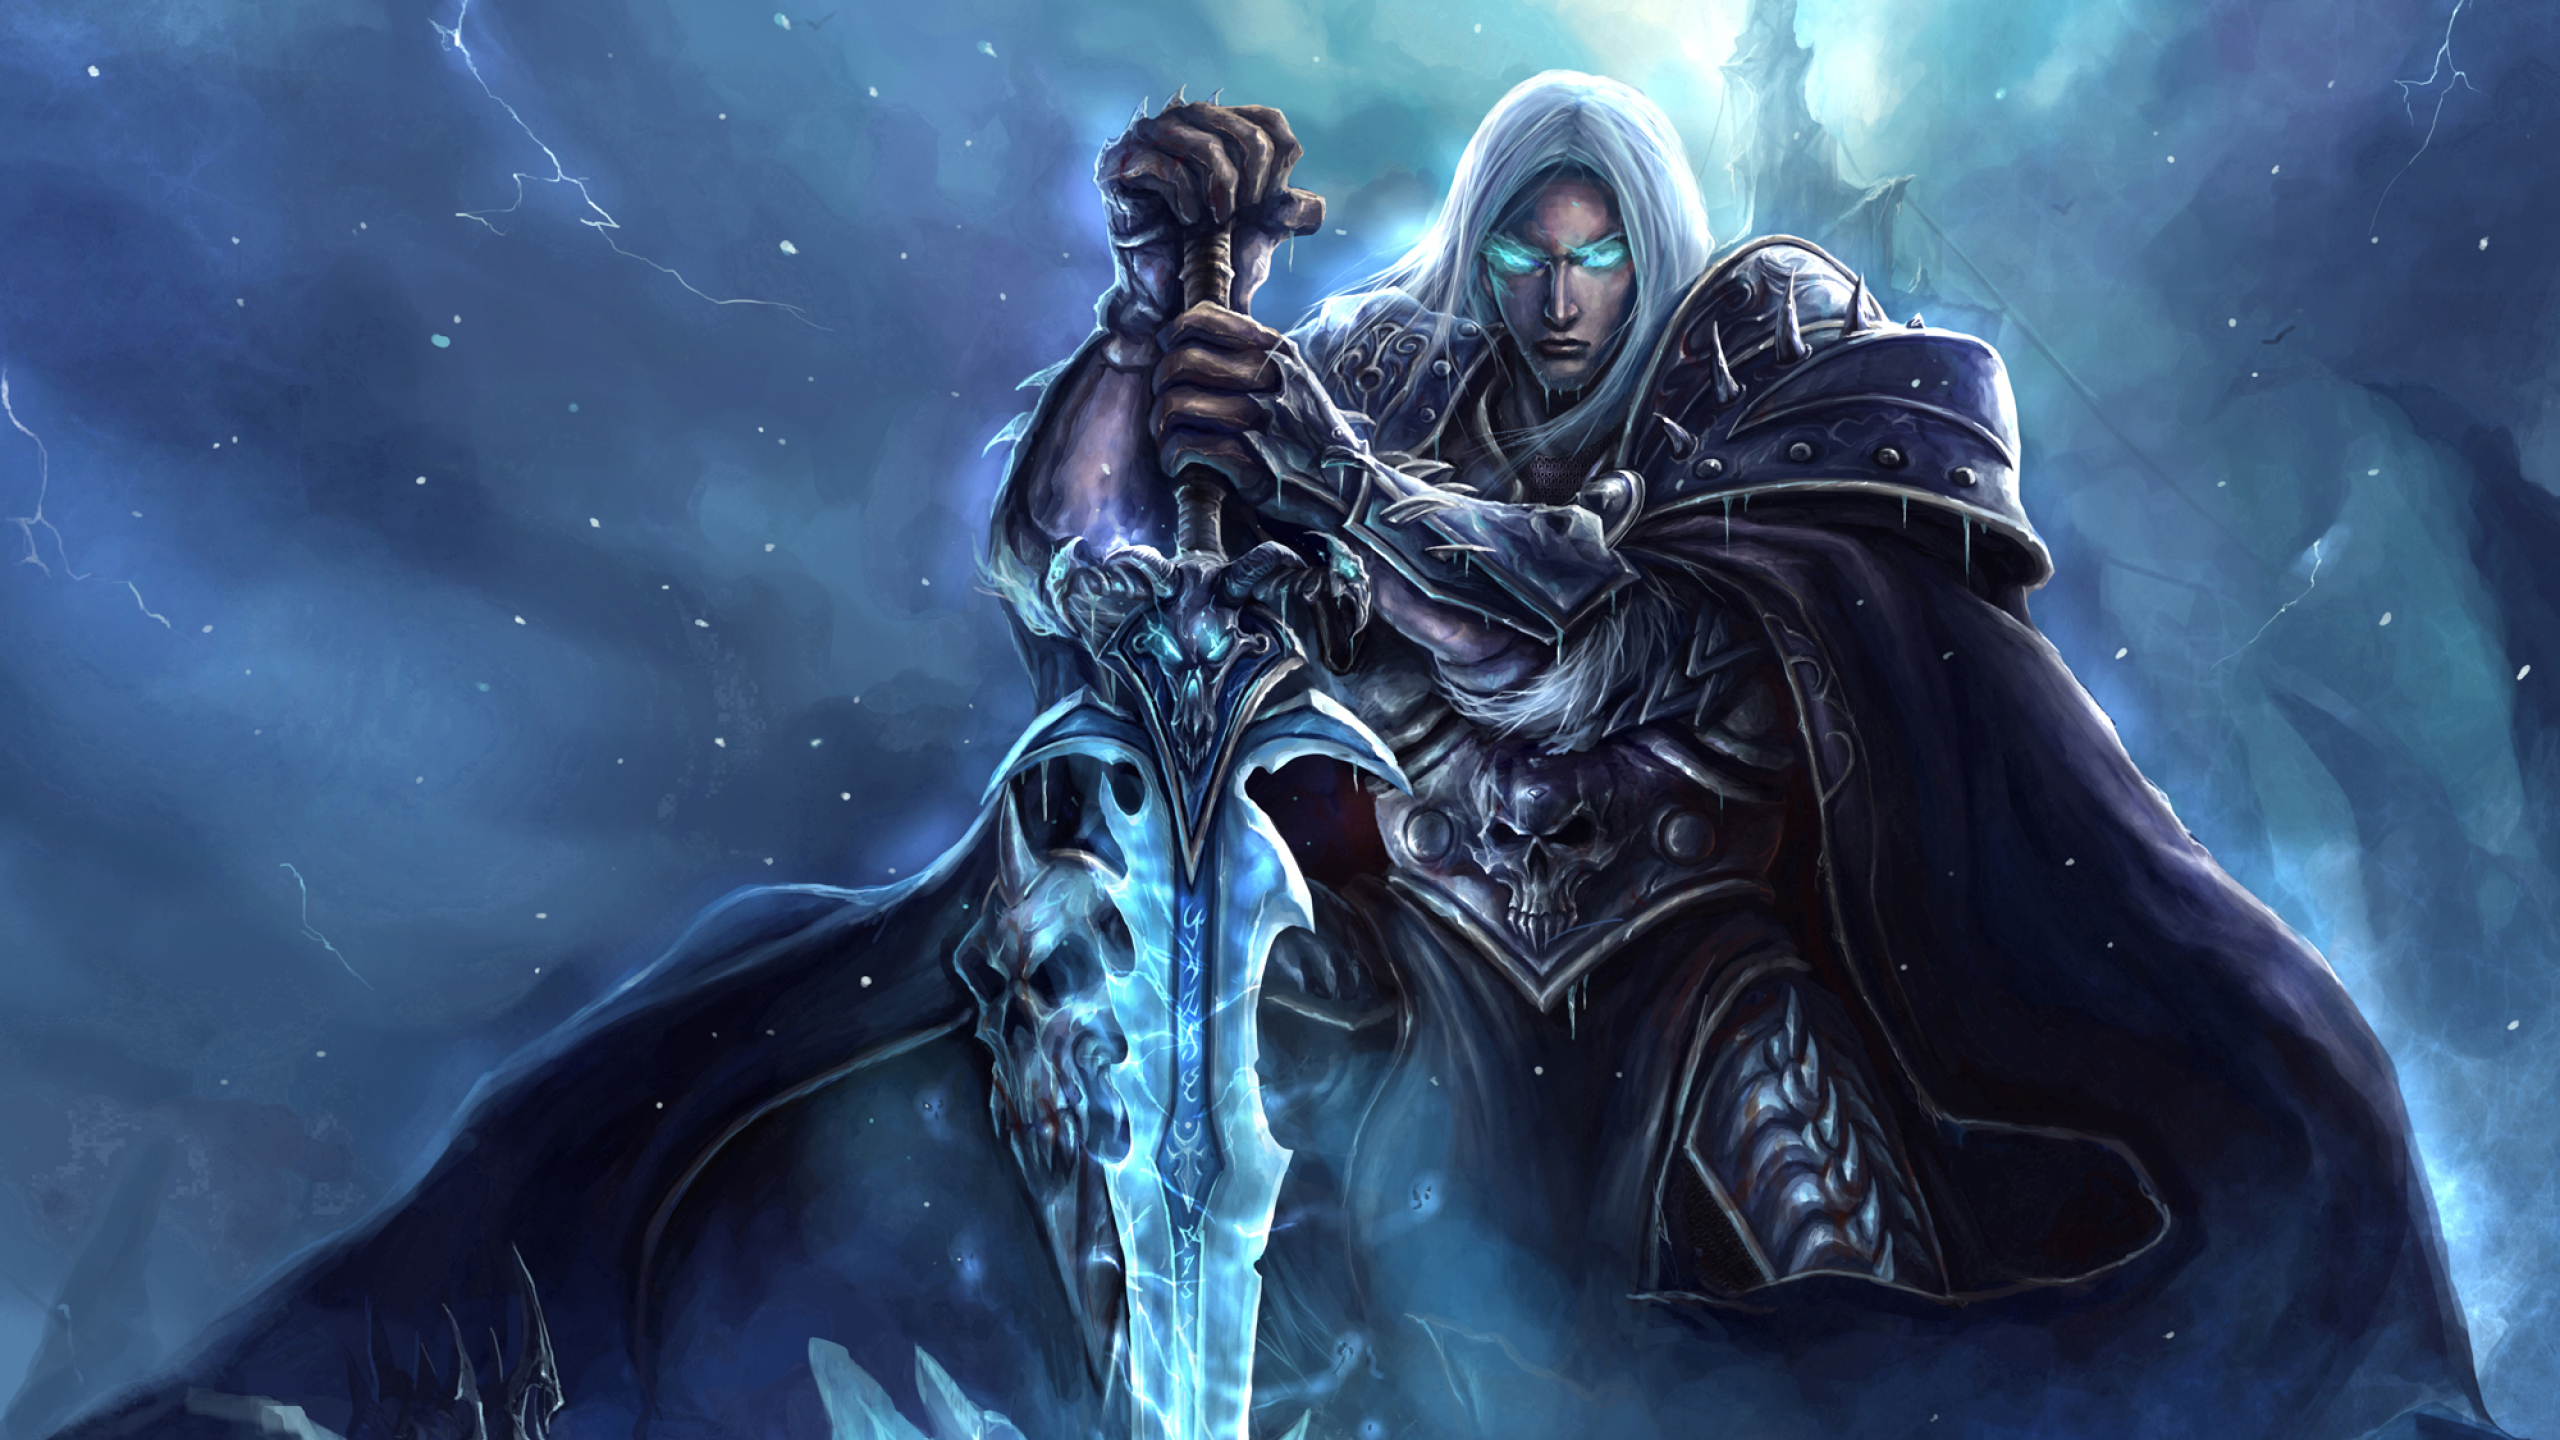 2560x1440 World Of Warcraft Lich King Arthas Menethil 1440p